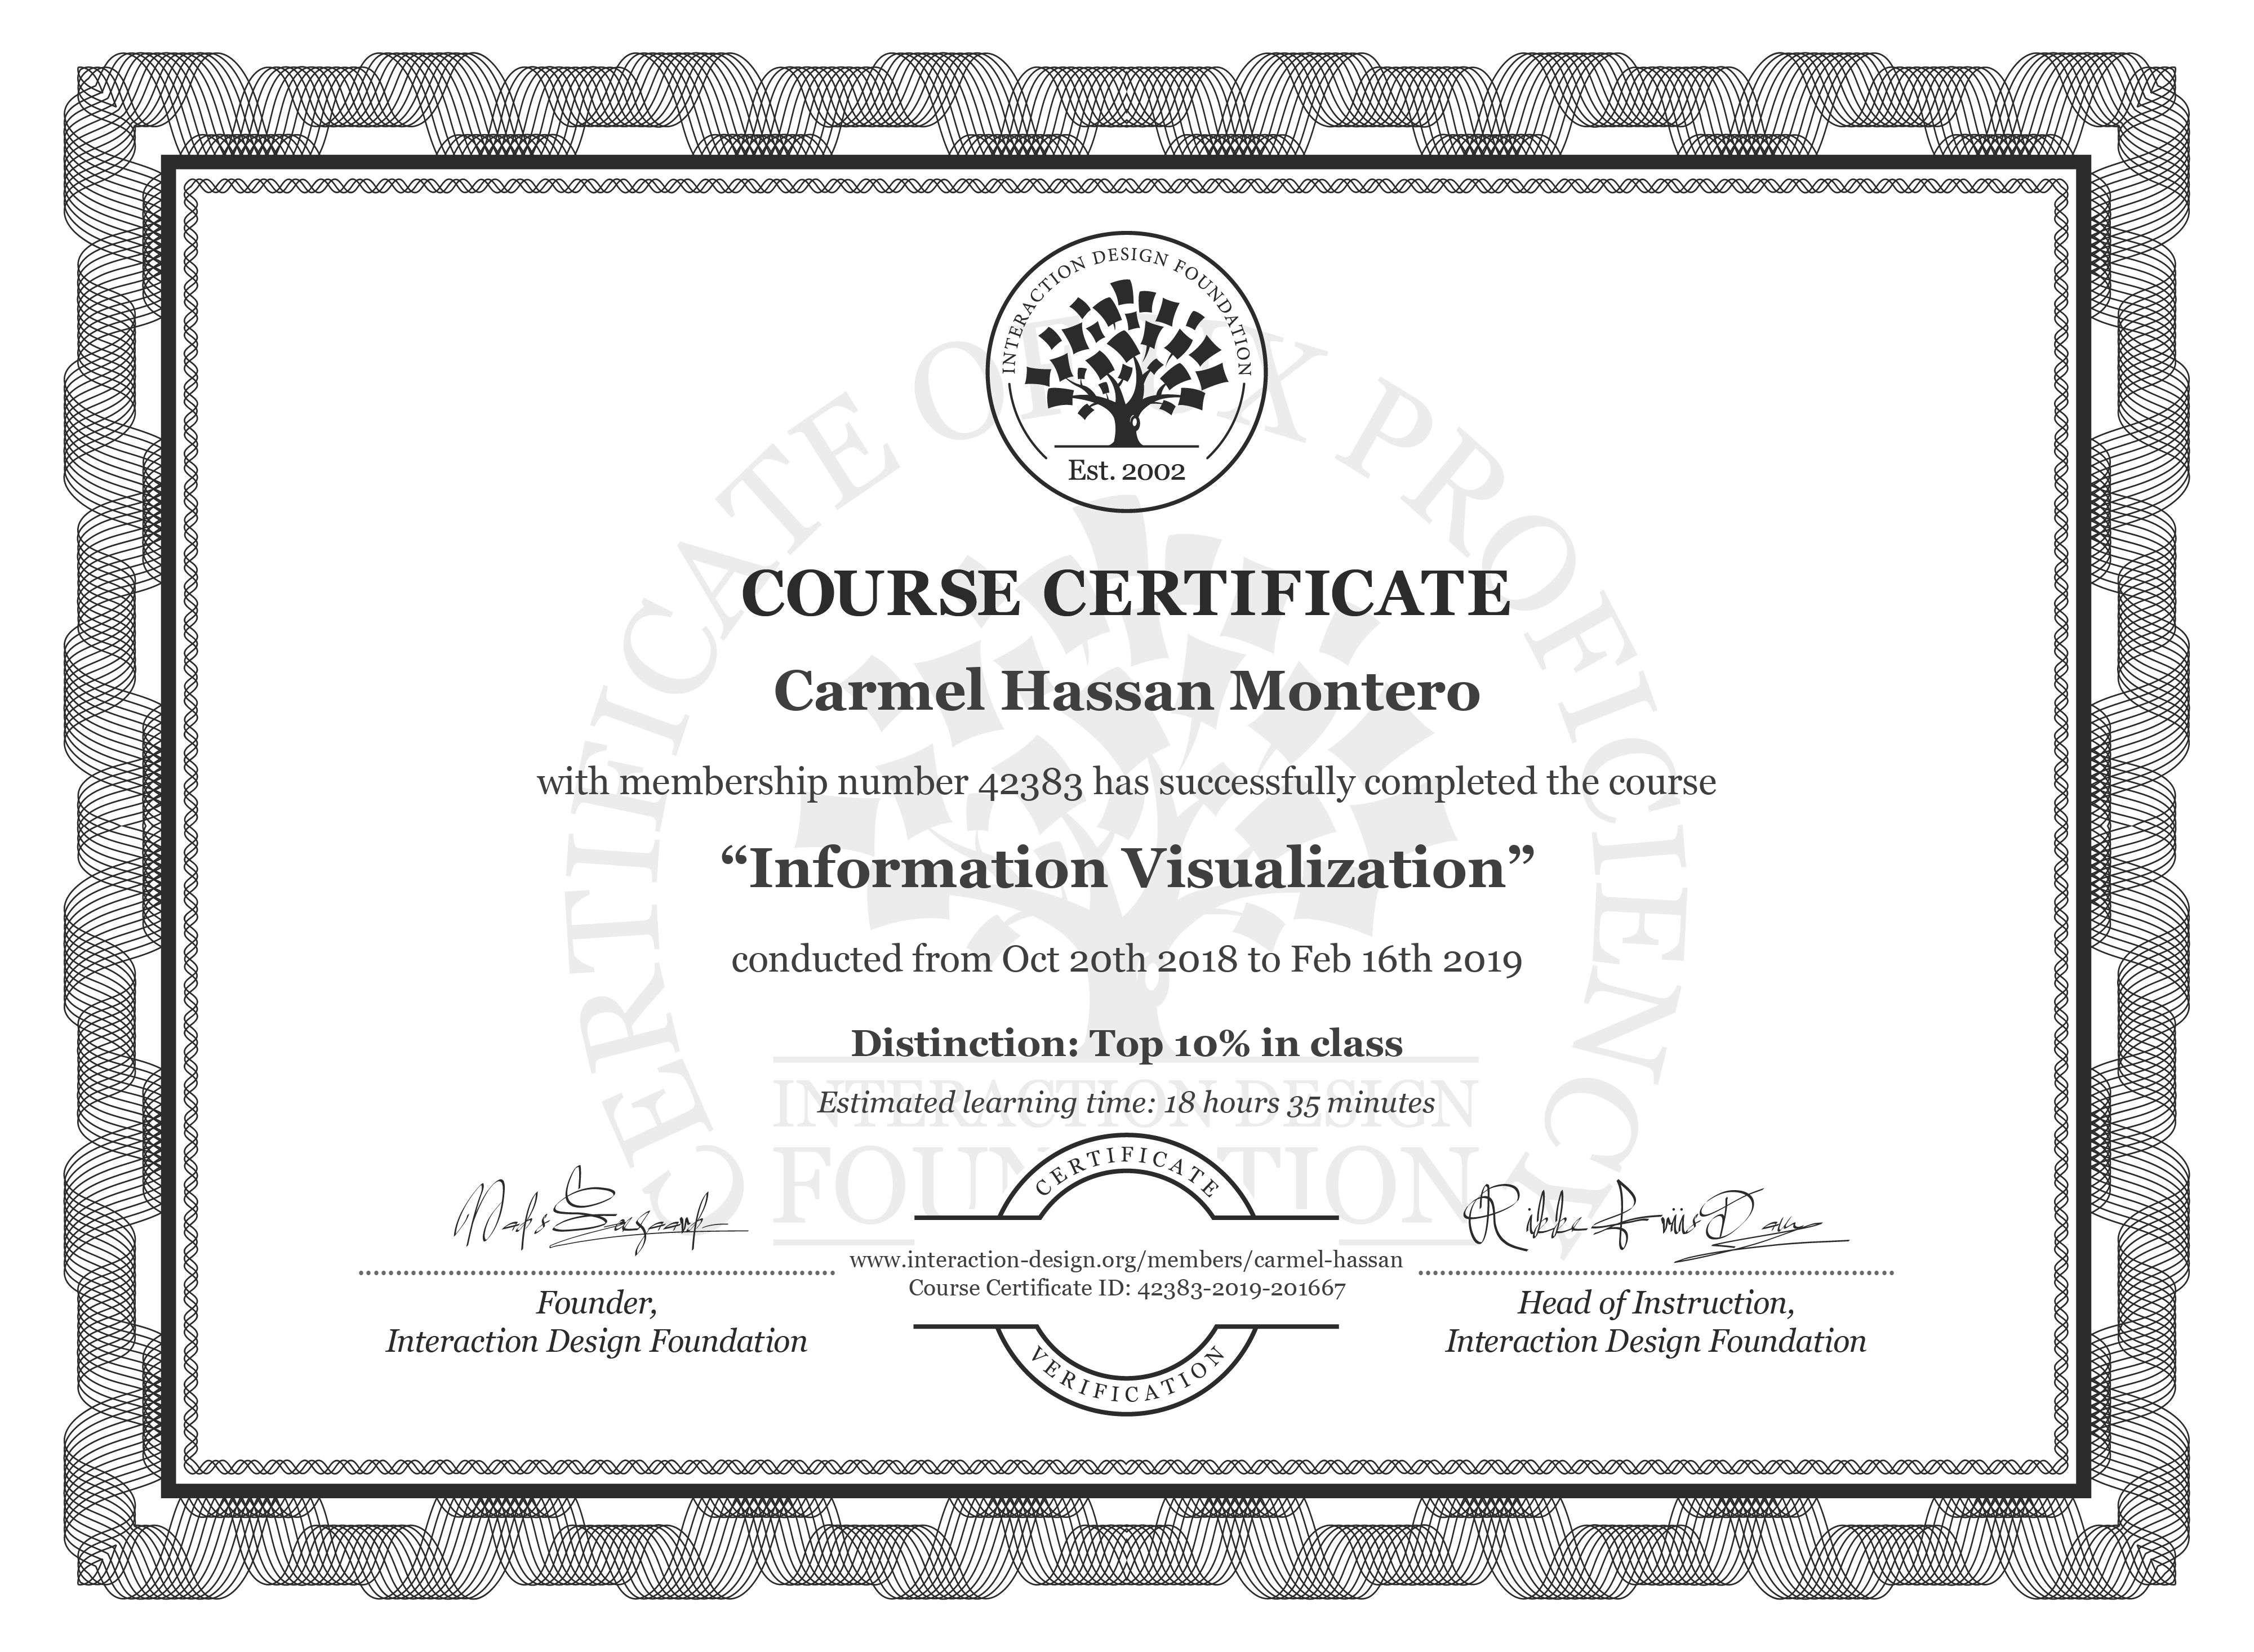 Carmel Hassan Montero: Course Certificate - Information Visualization